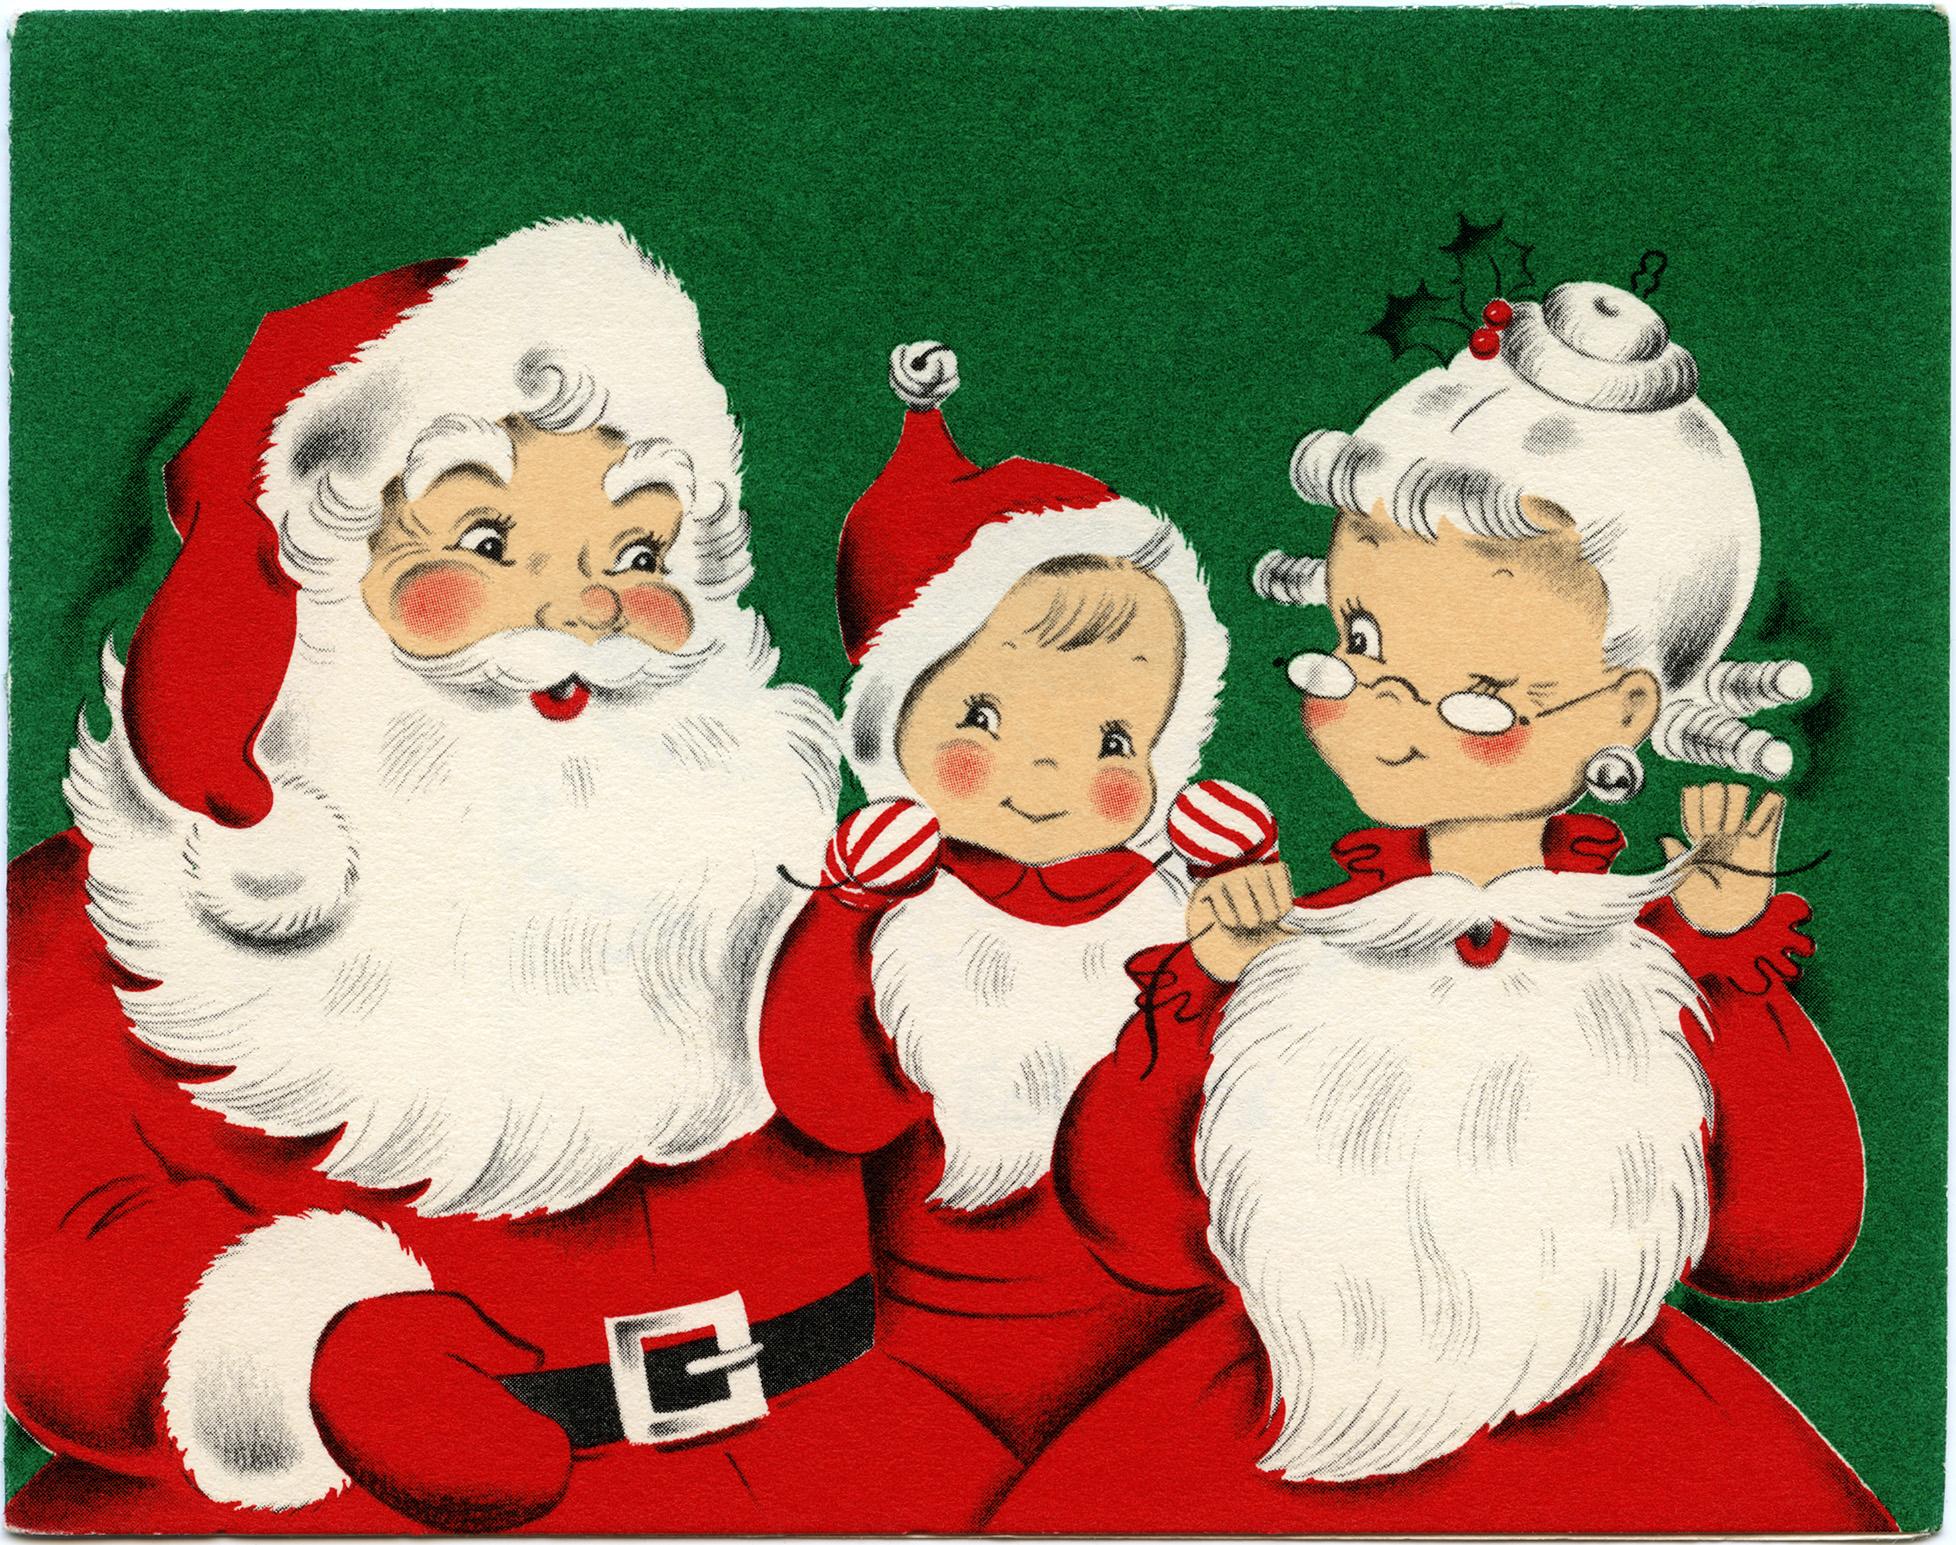 including daddy santa mommy santa and an adorable baby santa